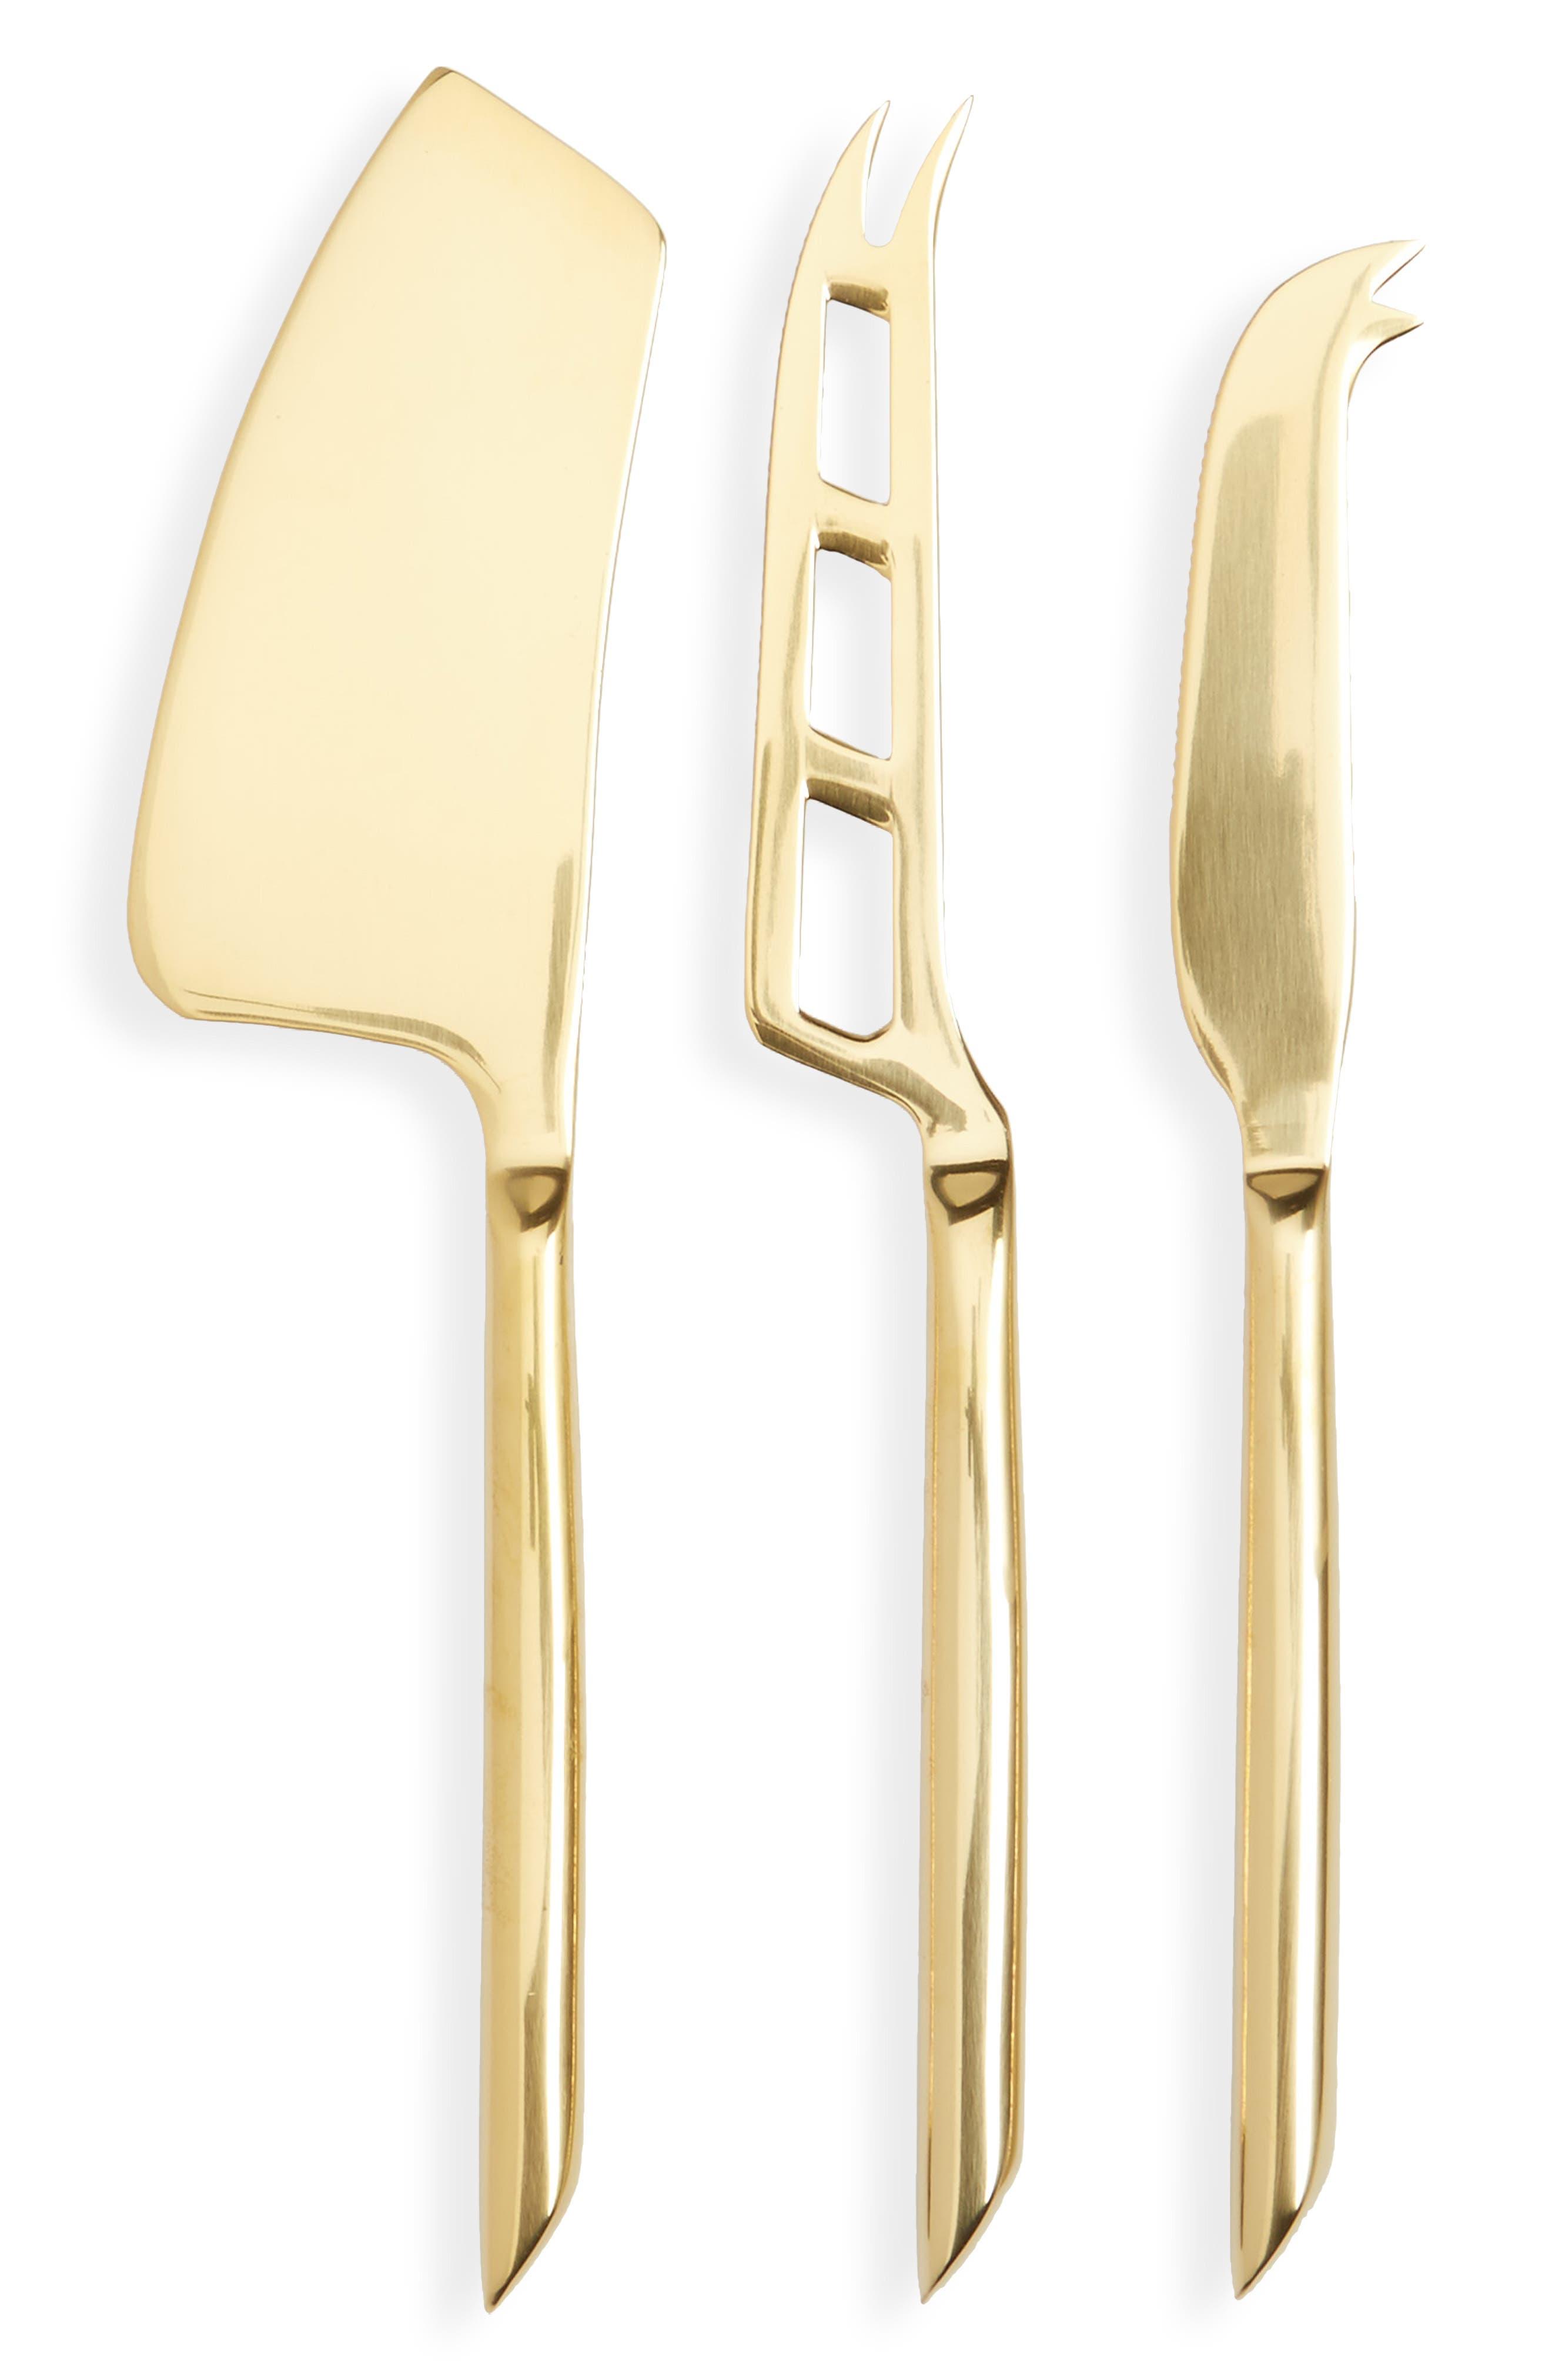 Main Image - Viski by True Fabrications Belmont Set of 3 Cheese Knives